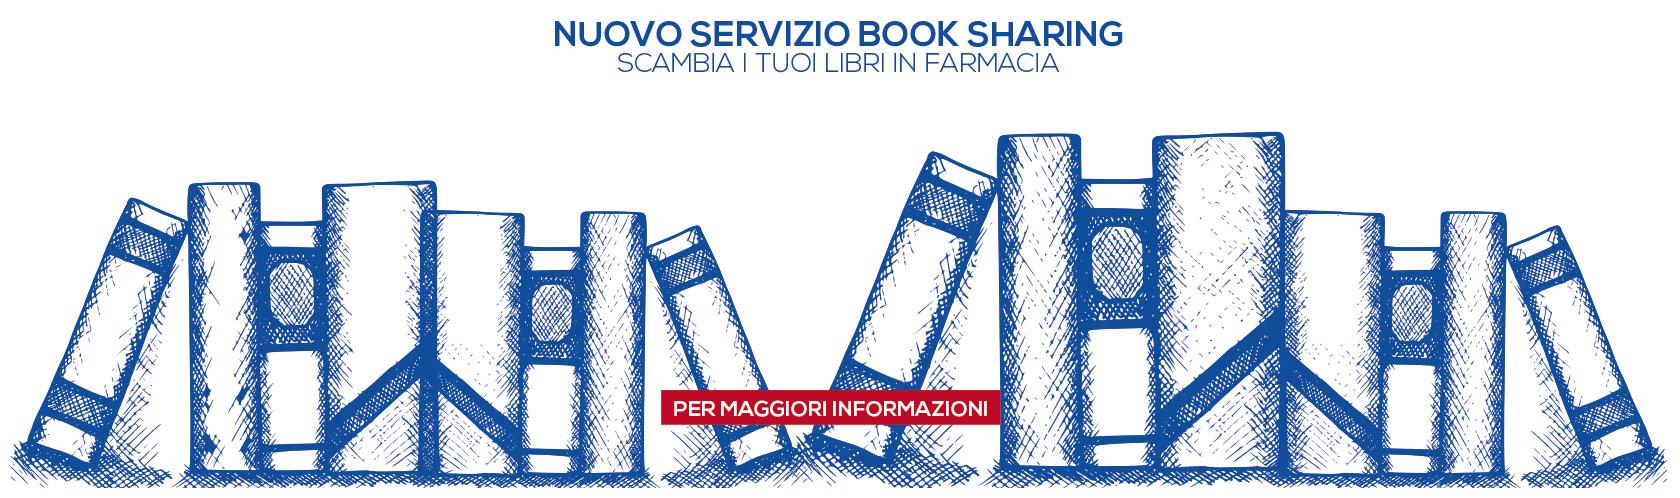 fb_book_sharing_big